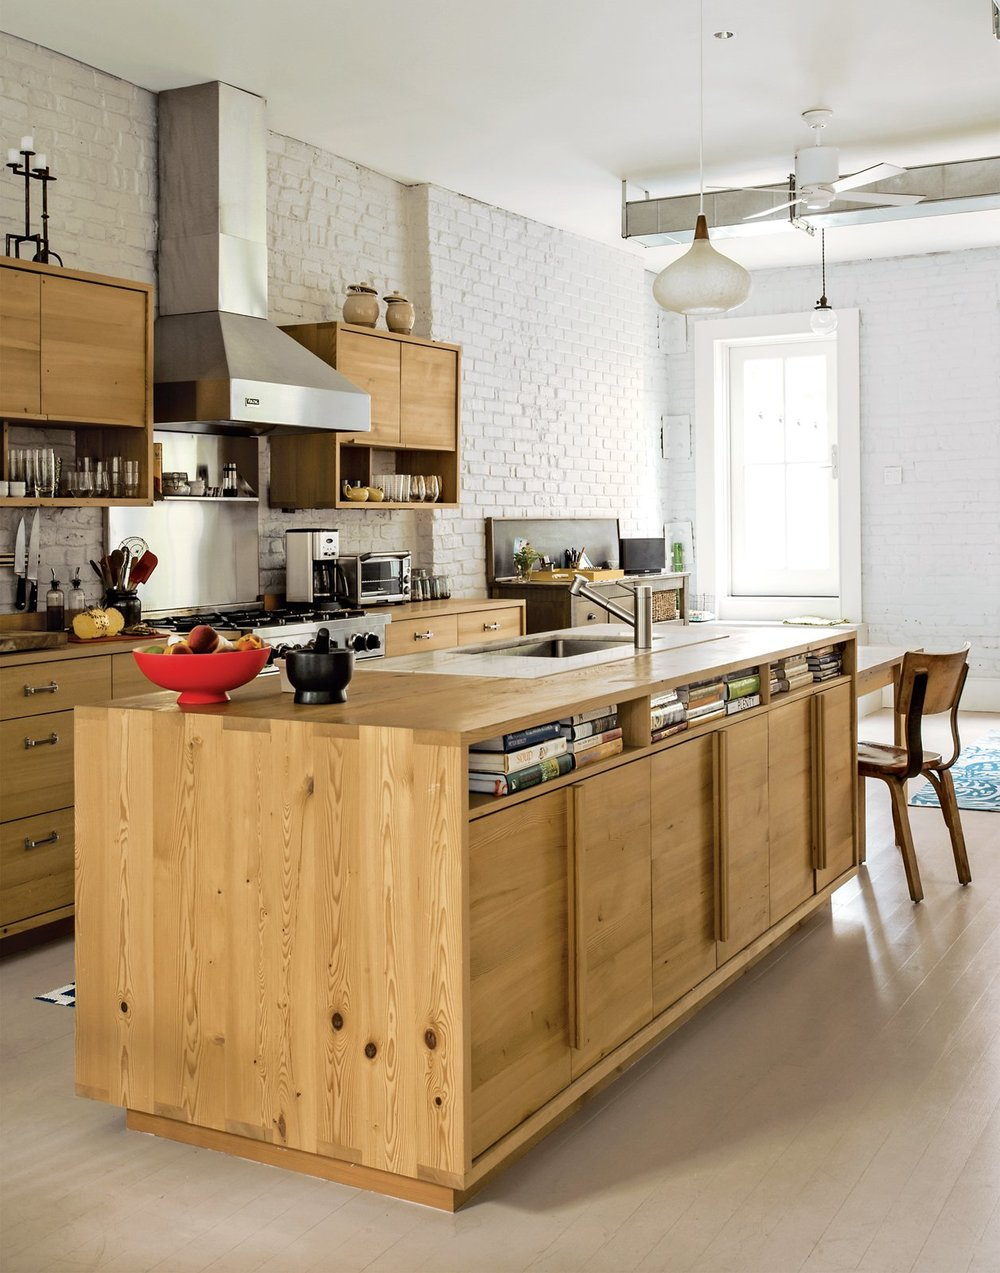 modern-kitchen-with-douglas-fir-island-and-cabinets.jpg